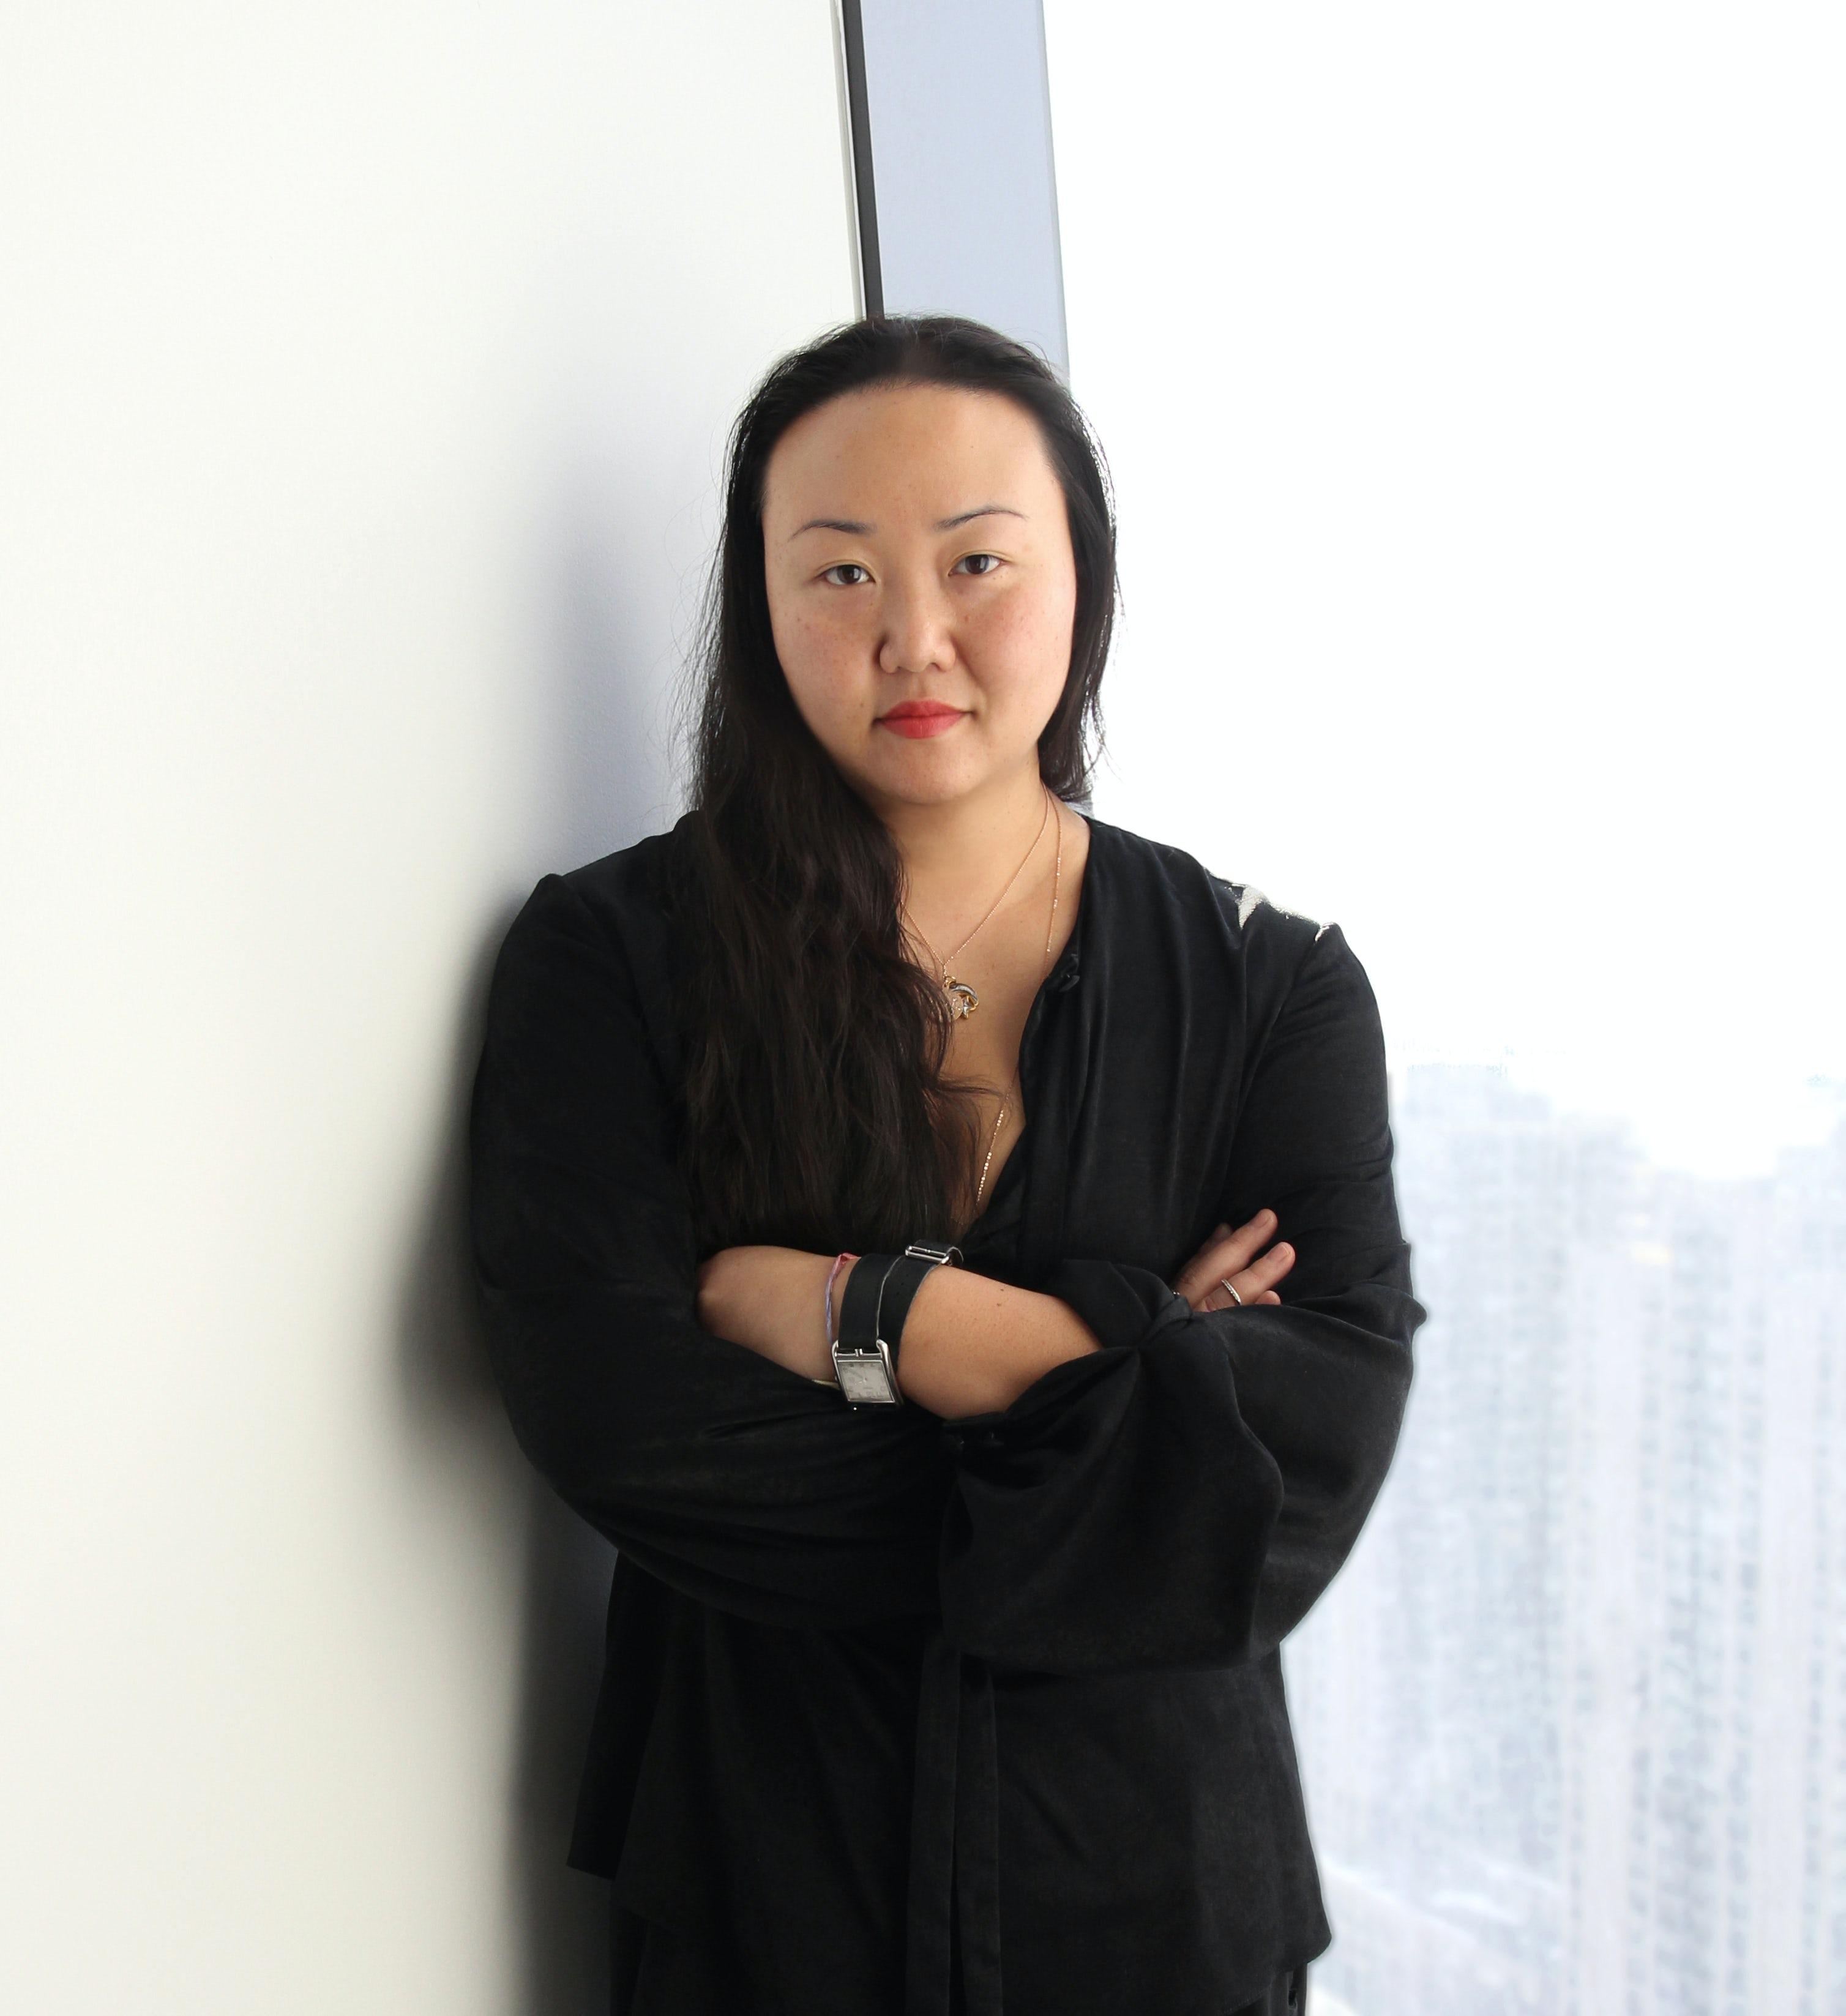 Hanya Yanagihara Named Editor of T Magazine, Jed Root Investor Speaks and More...